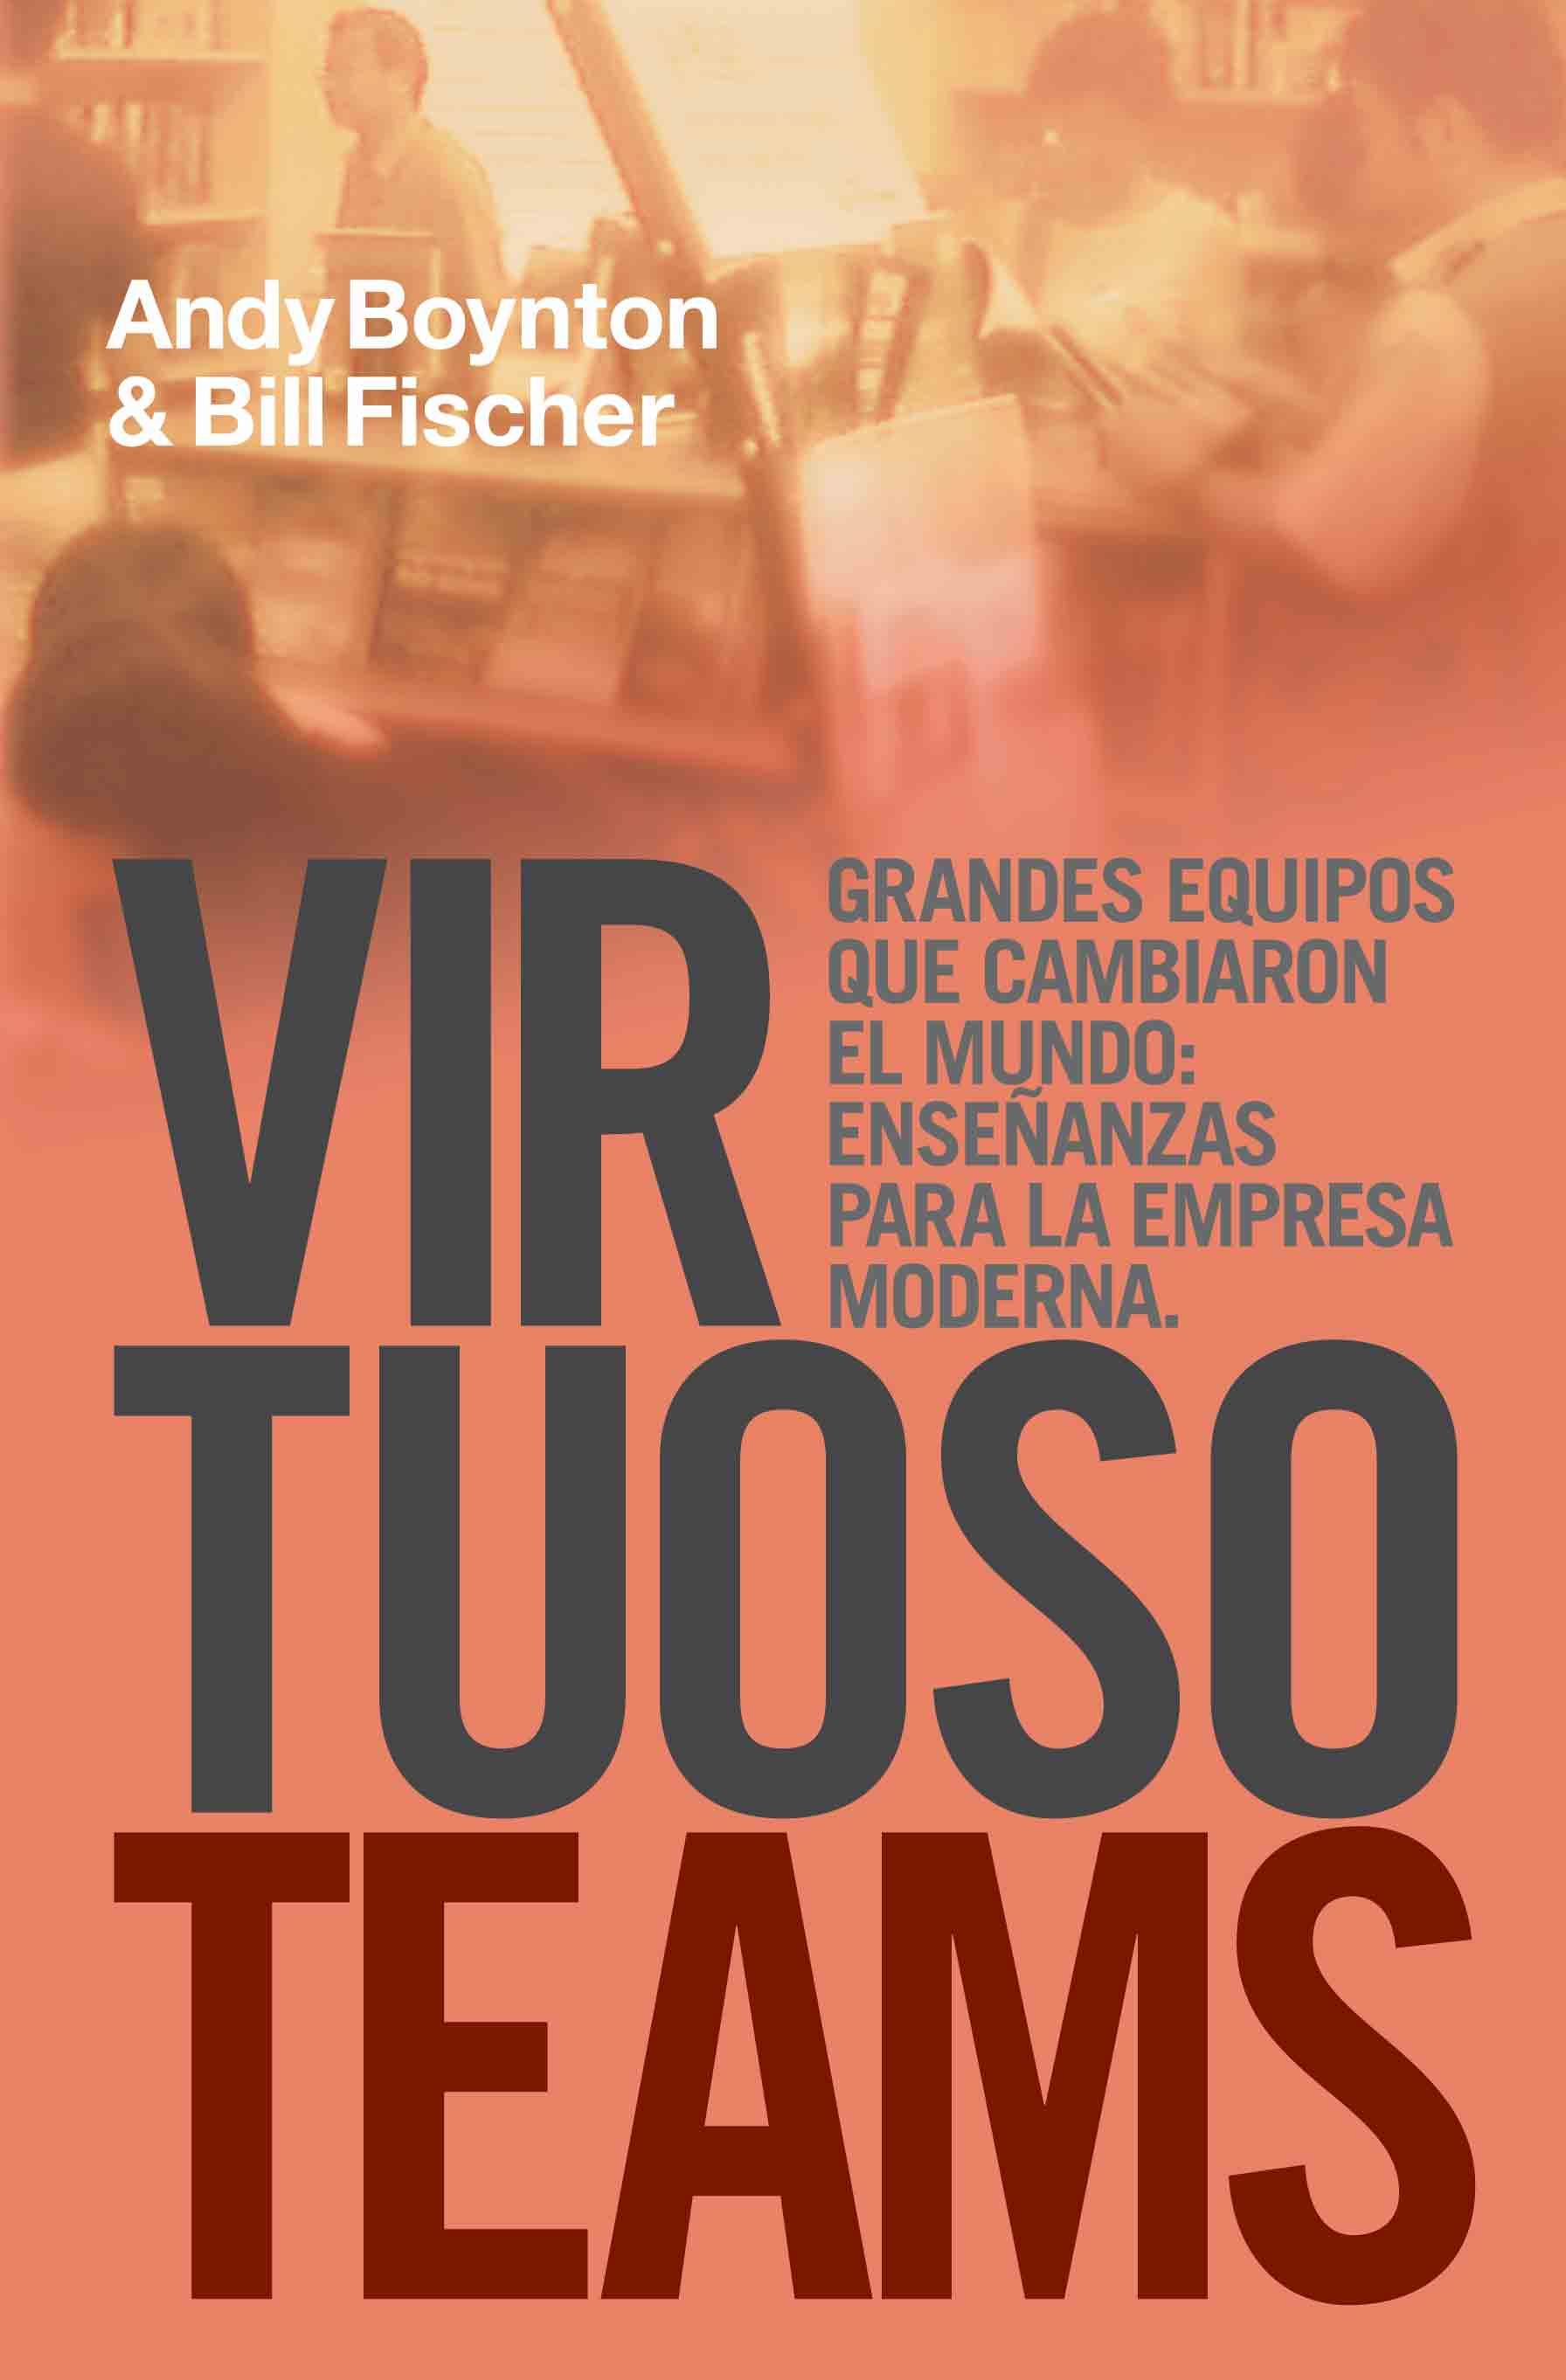 Virtuoso Teams